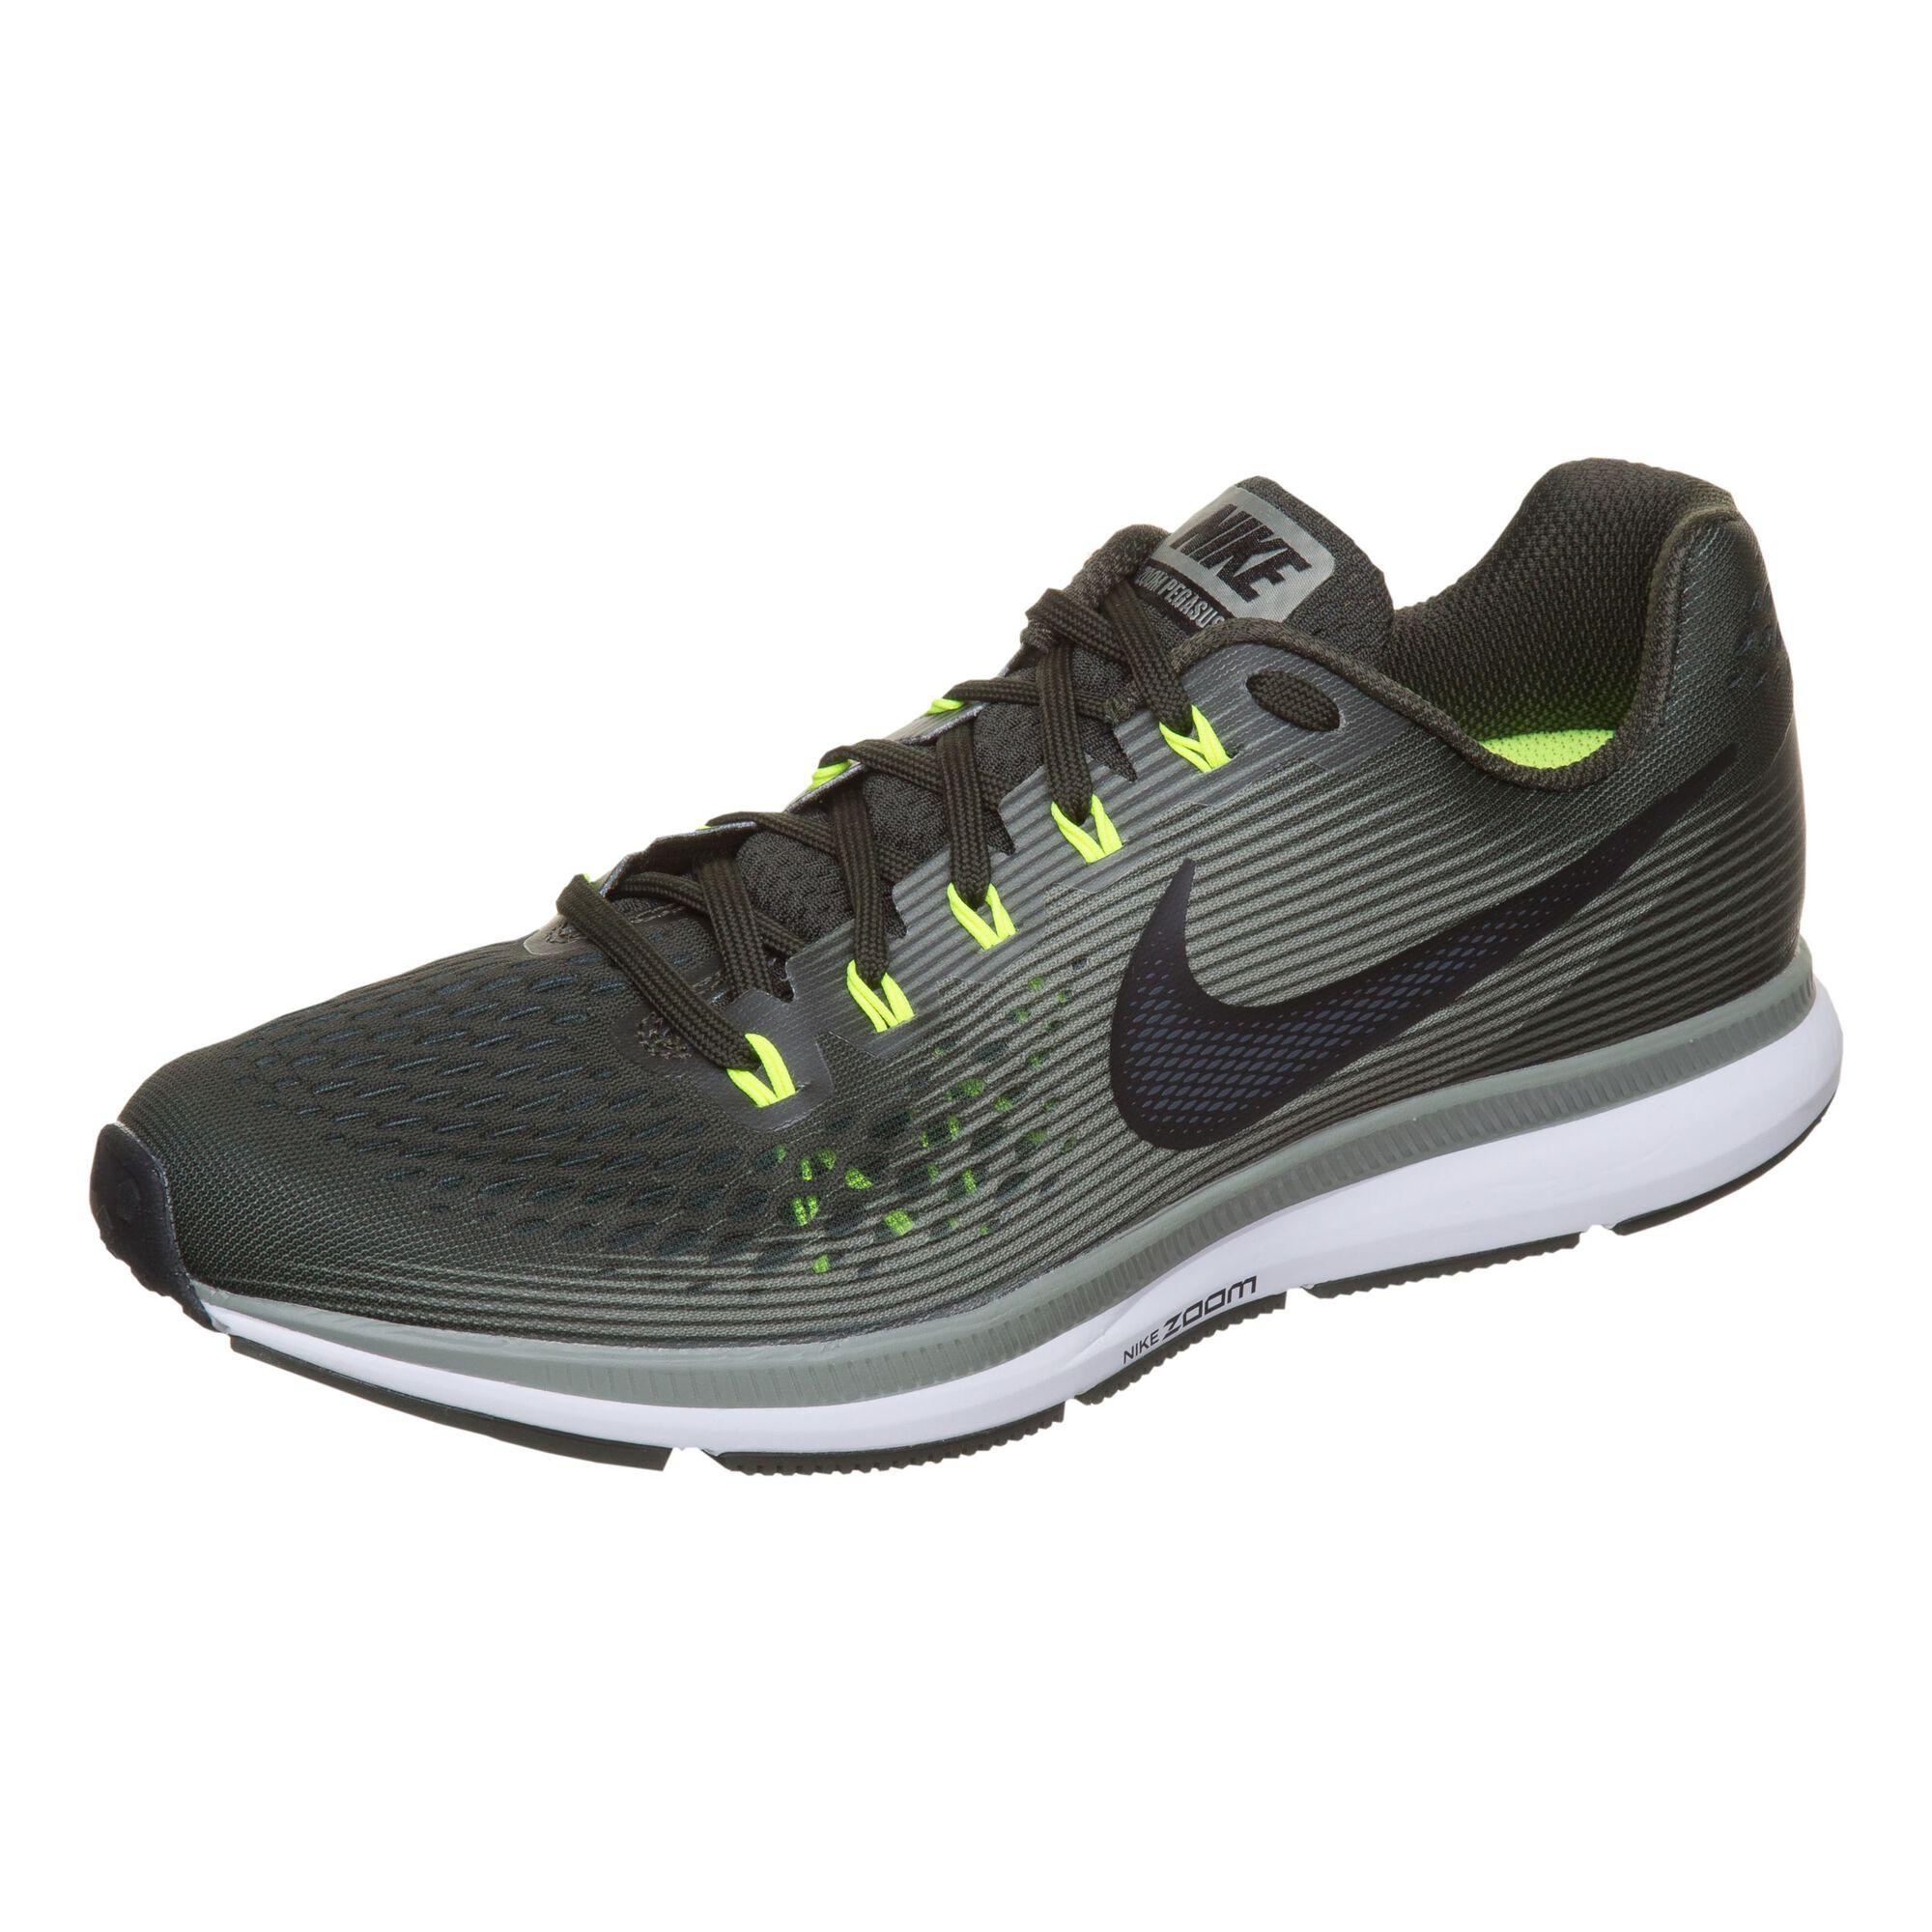 info for 7bf1c 2560c Nike · Nike · Nike · Nike · Nike · Nike · Nike · Nike · Nike · Nike. Air  Zoom Pegasus 34 ...